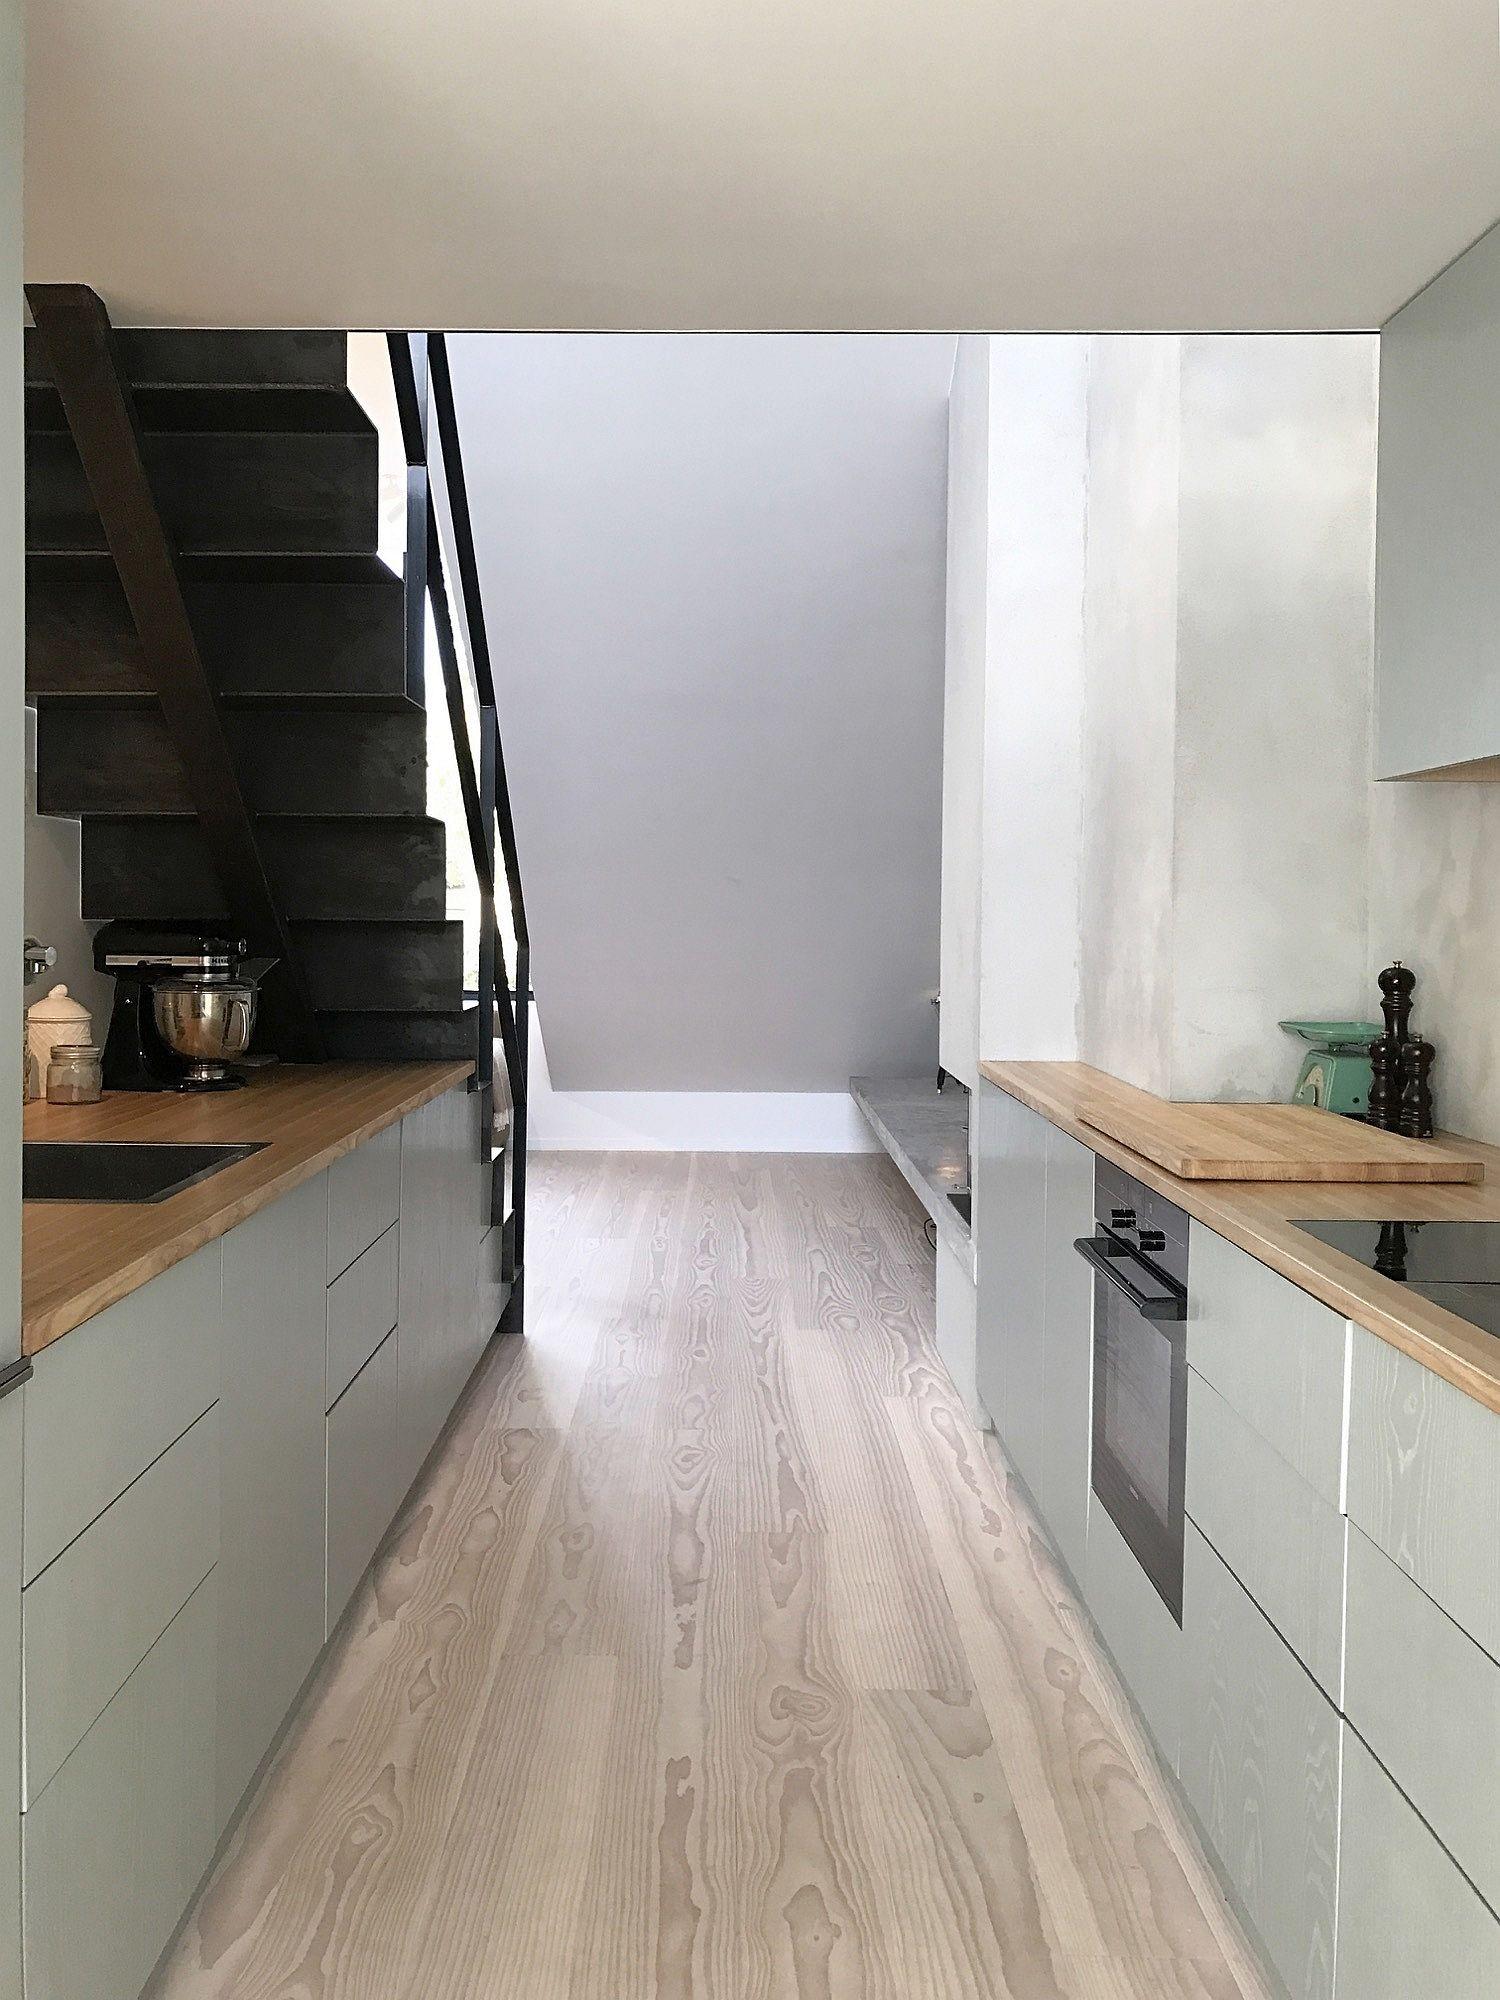 Combining light and dark elements inside the Norwegian apartment